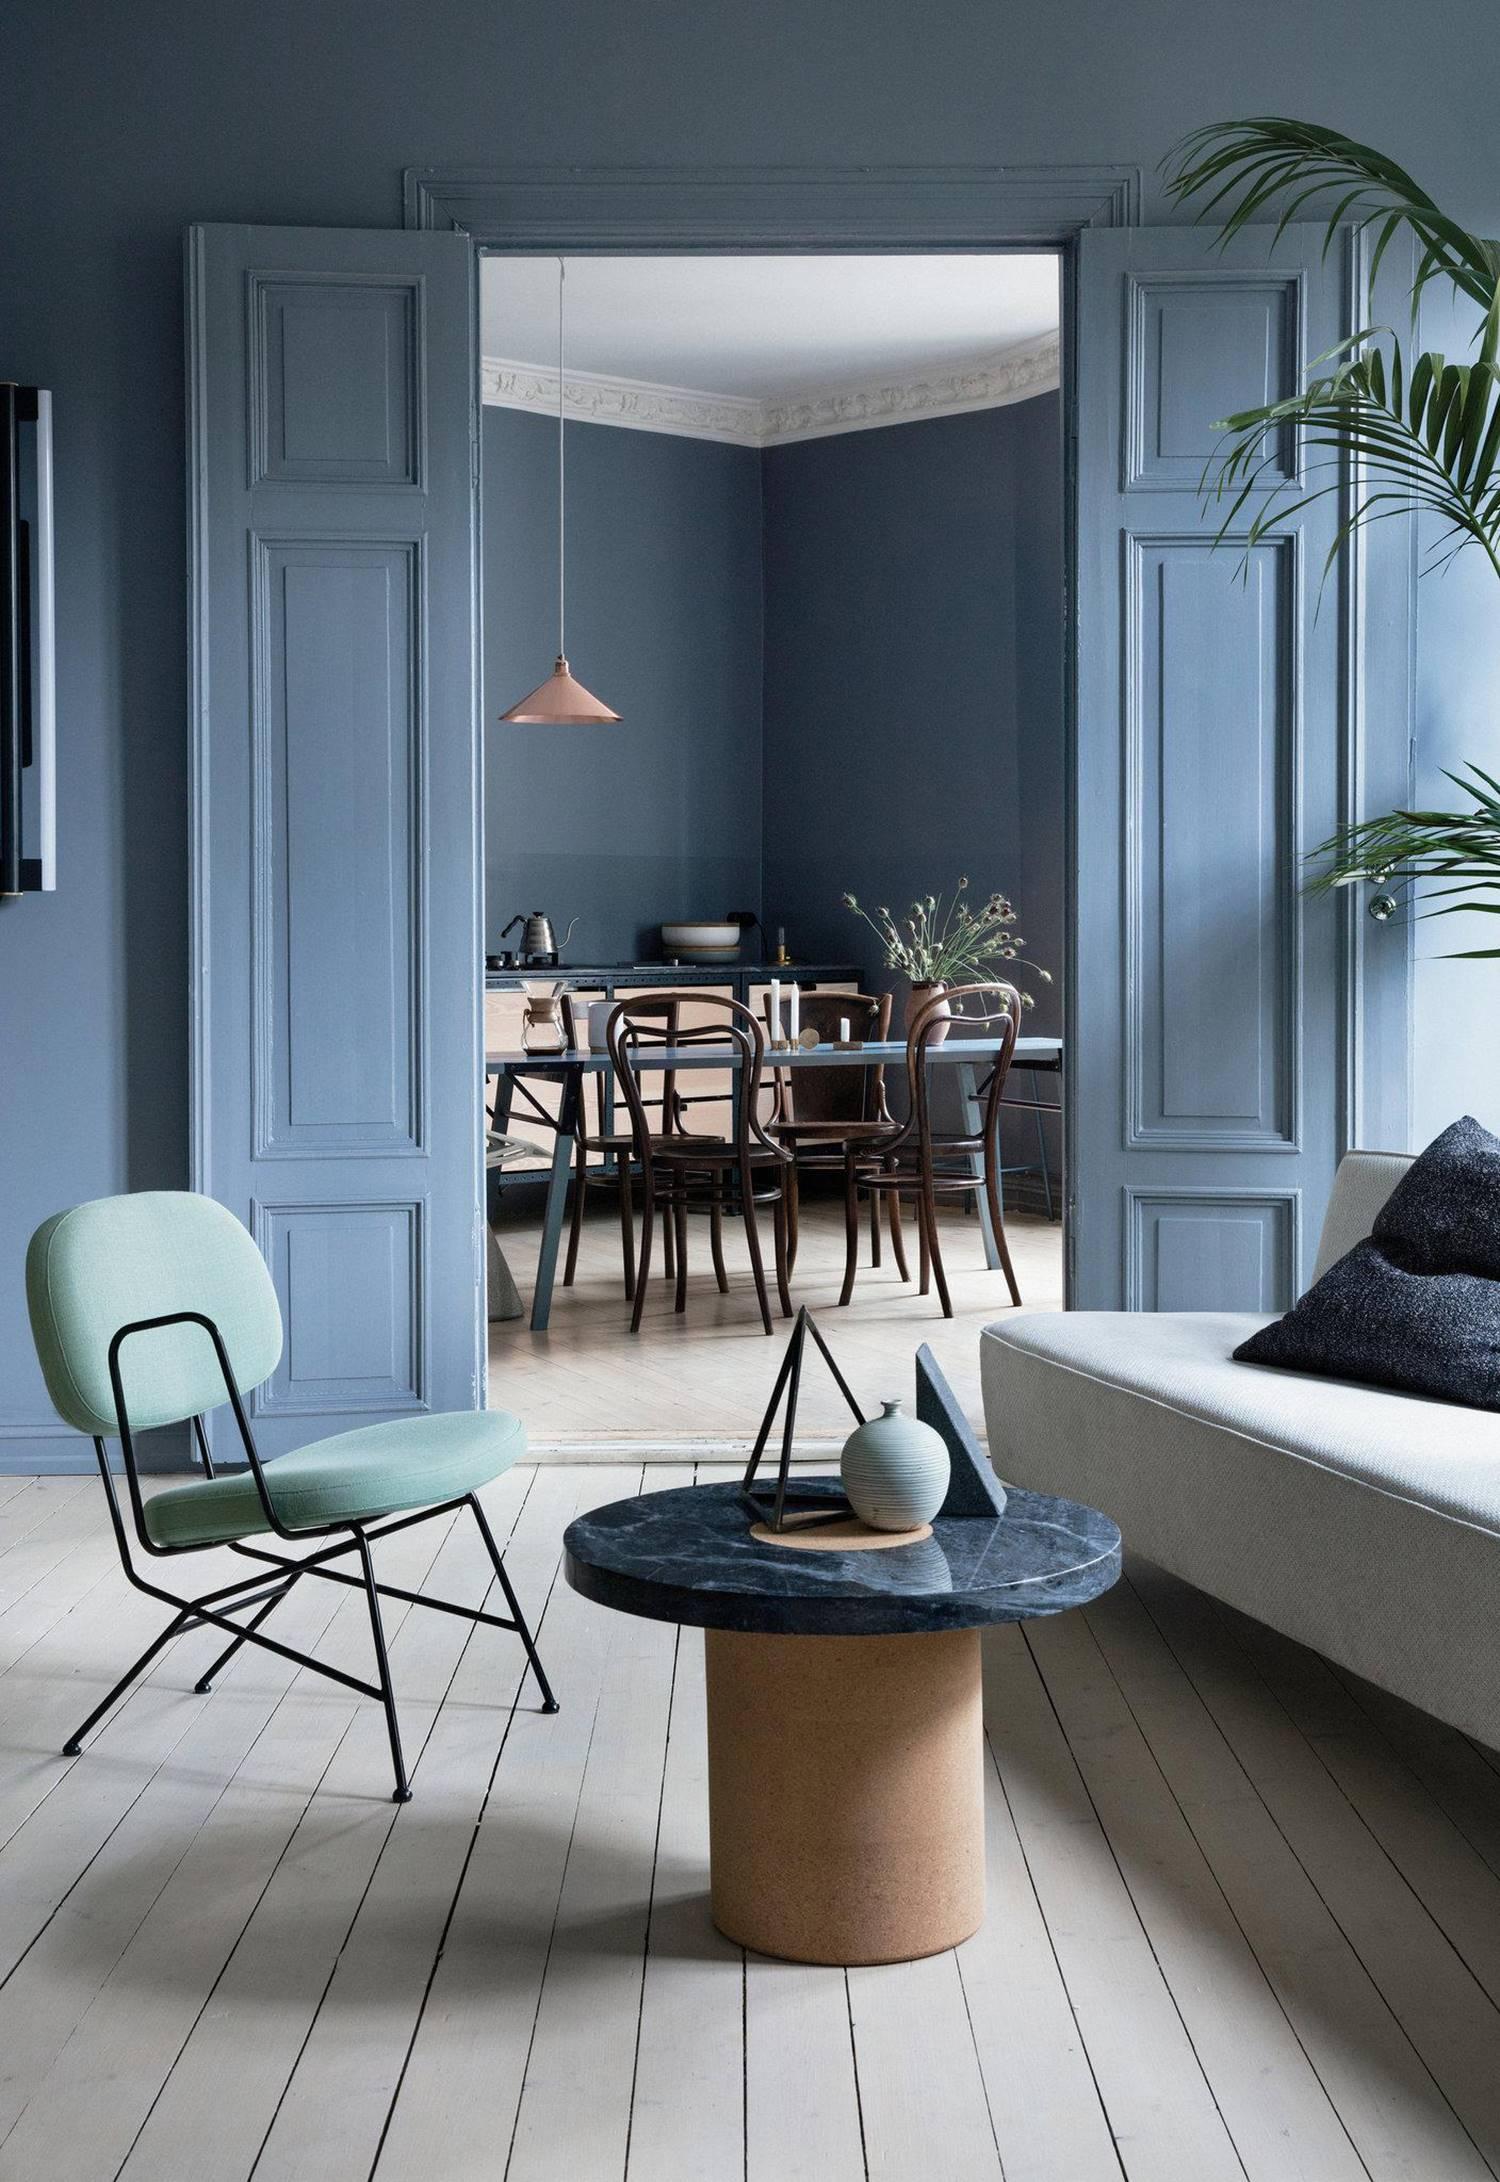 Interior neutro de paredes azul-grisáceas.